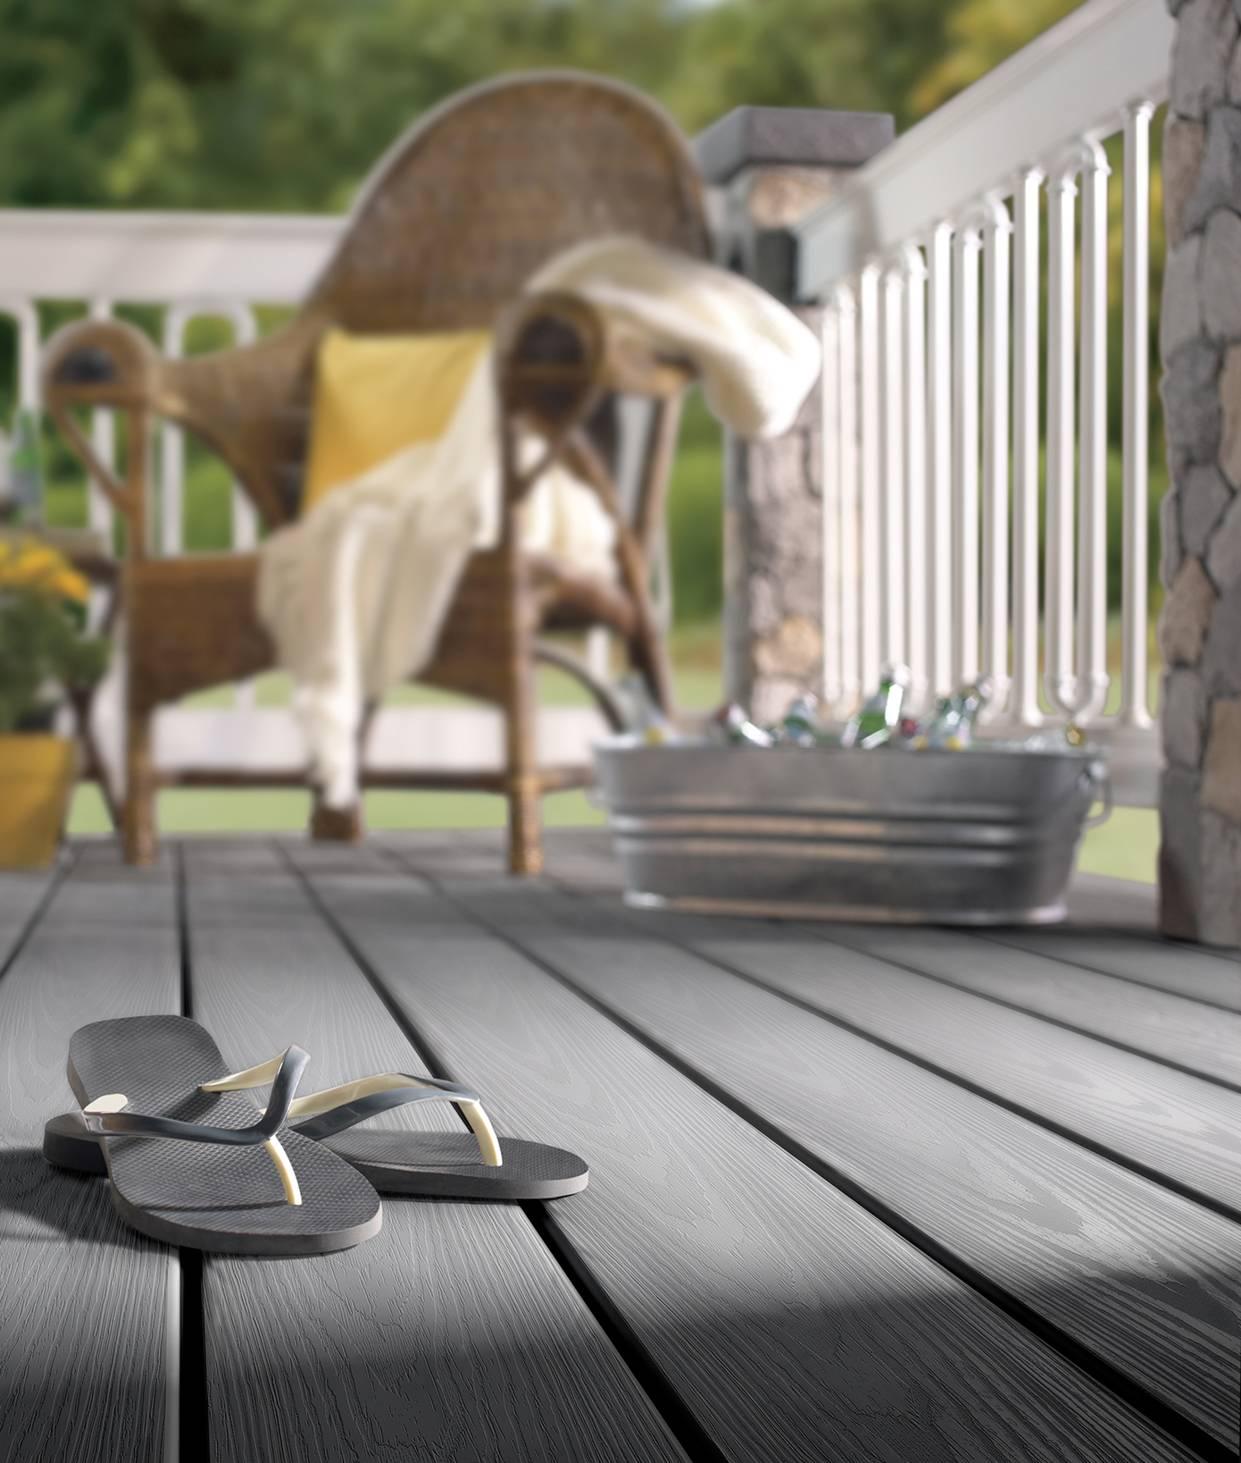 Composite decking low composite decking prices edecks for Evergrain decking cost